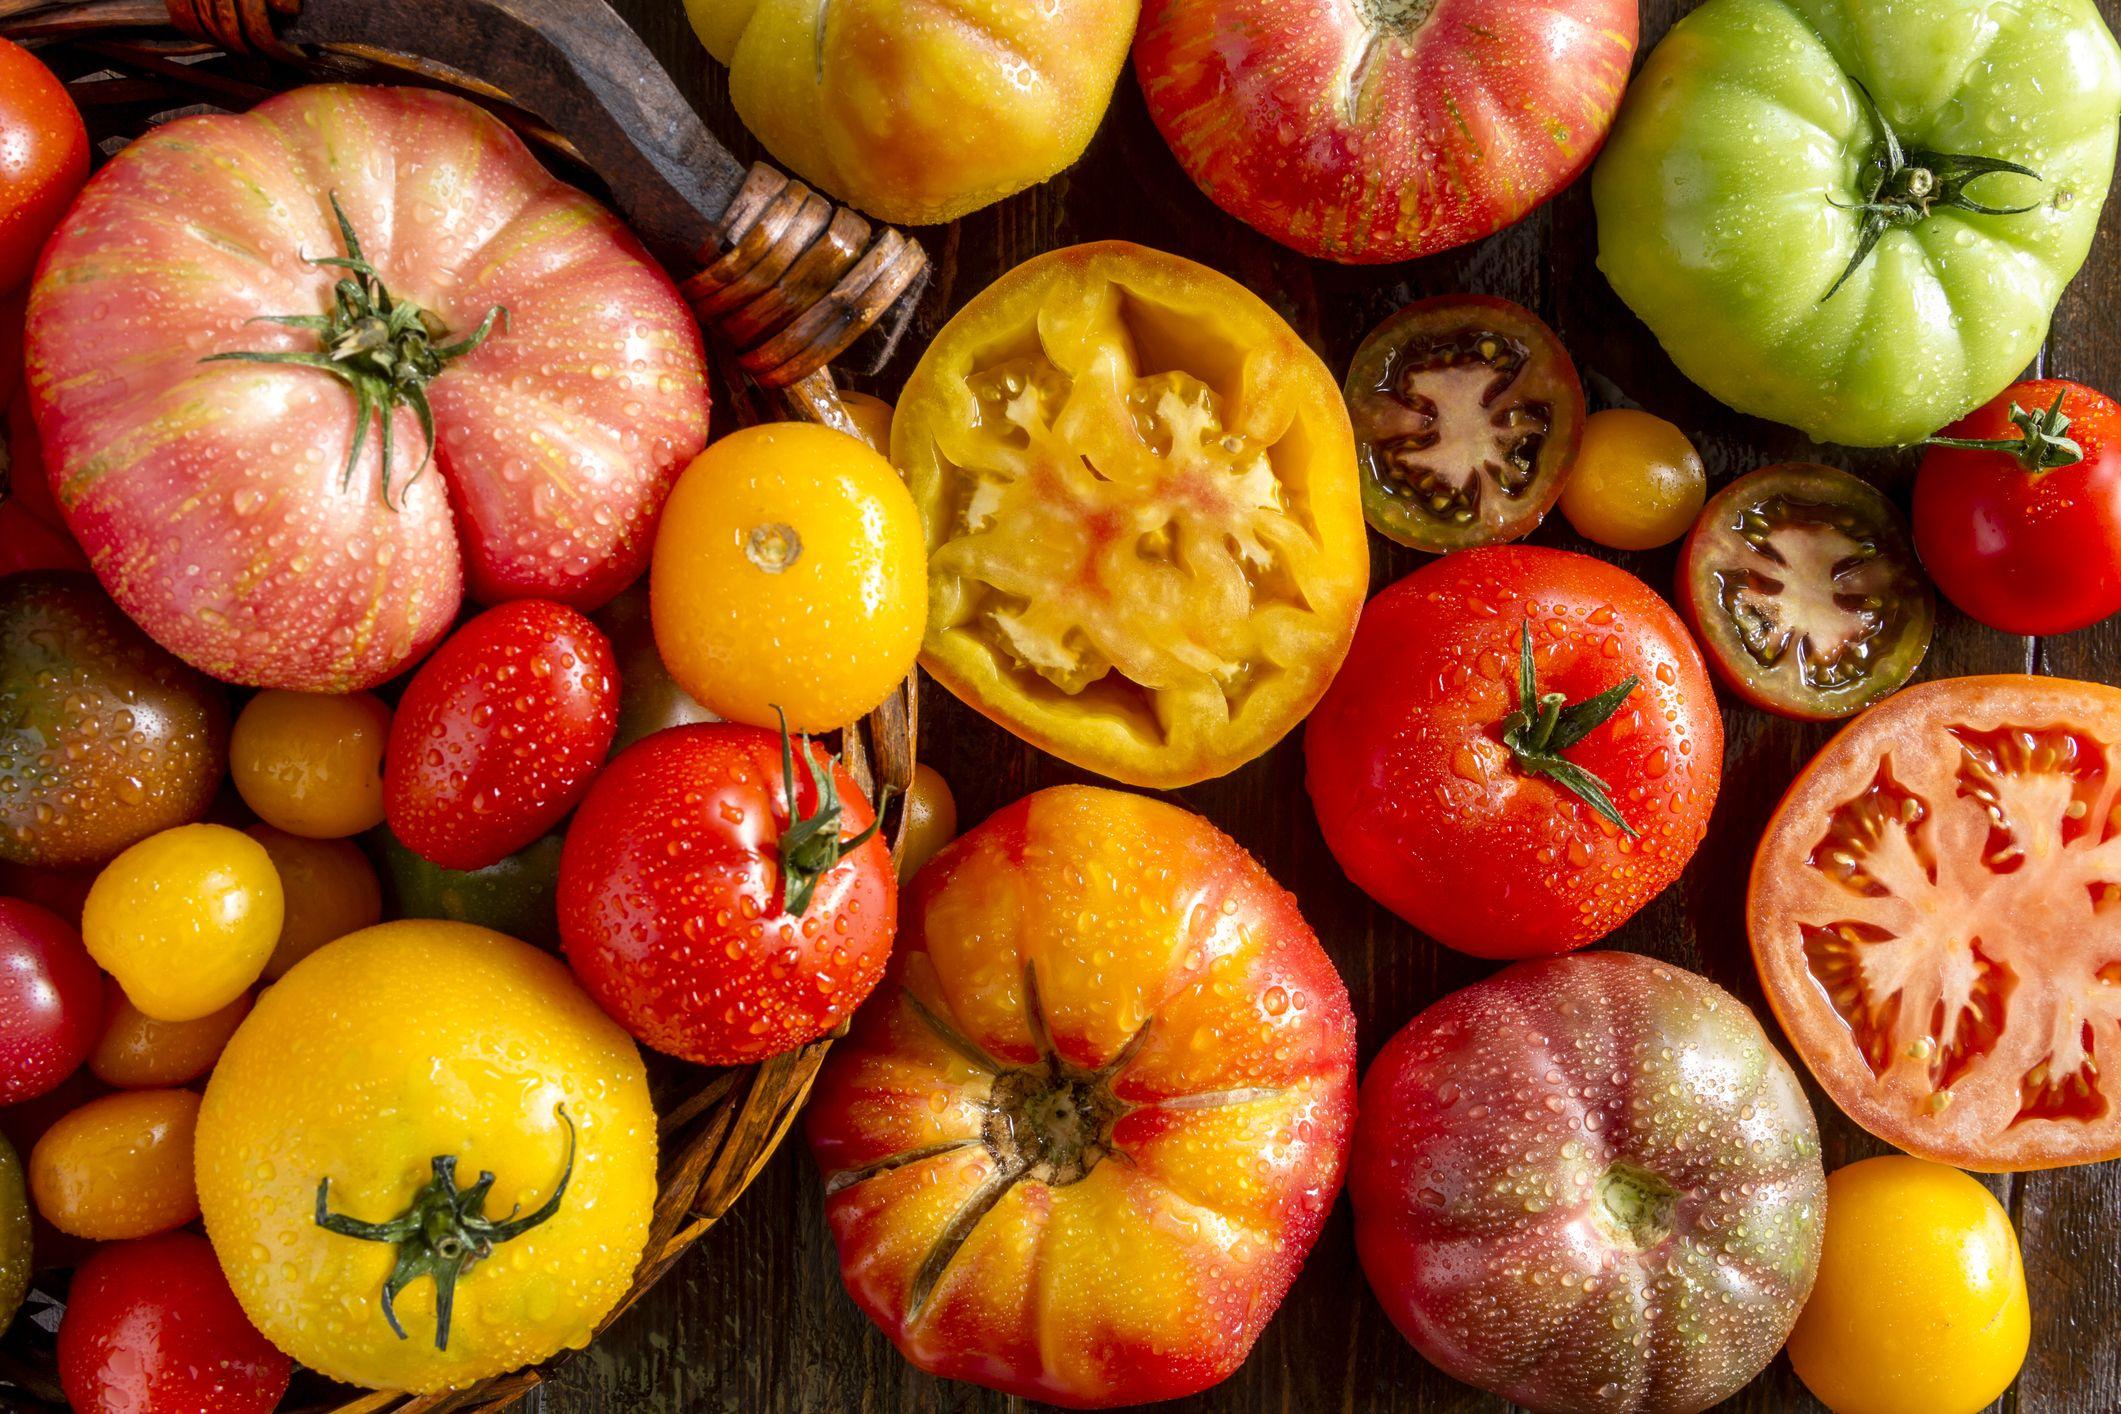 19 Best Heirloom Tomato Varieties You Can Grow Types Of Heirloom